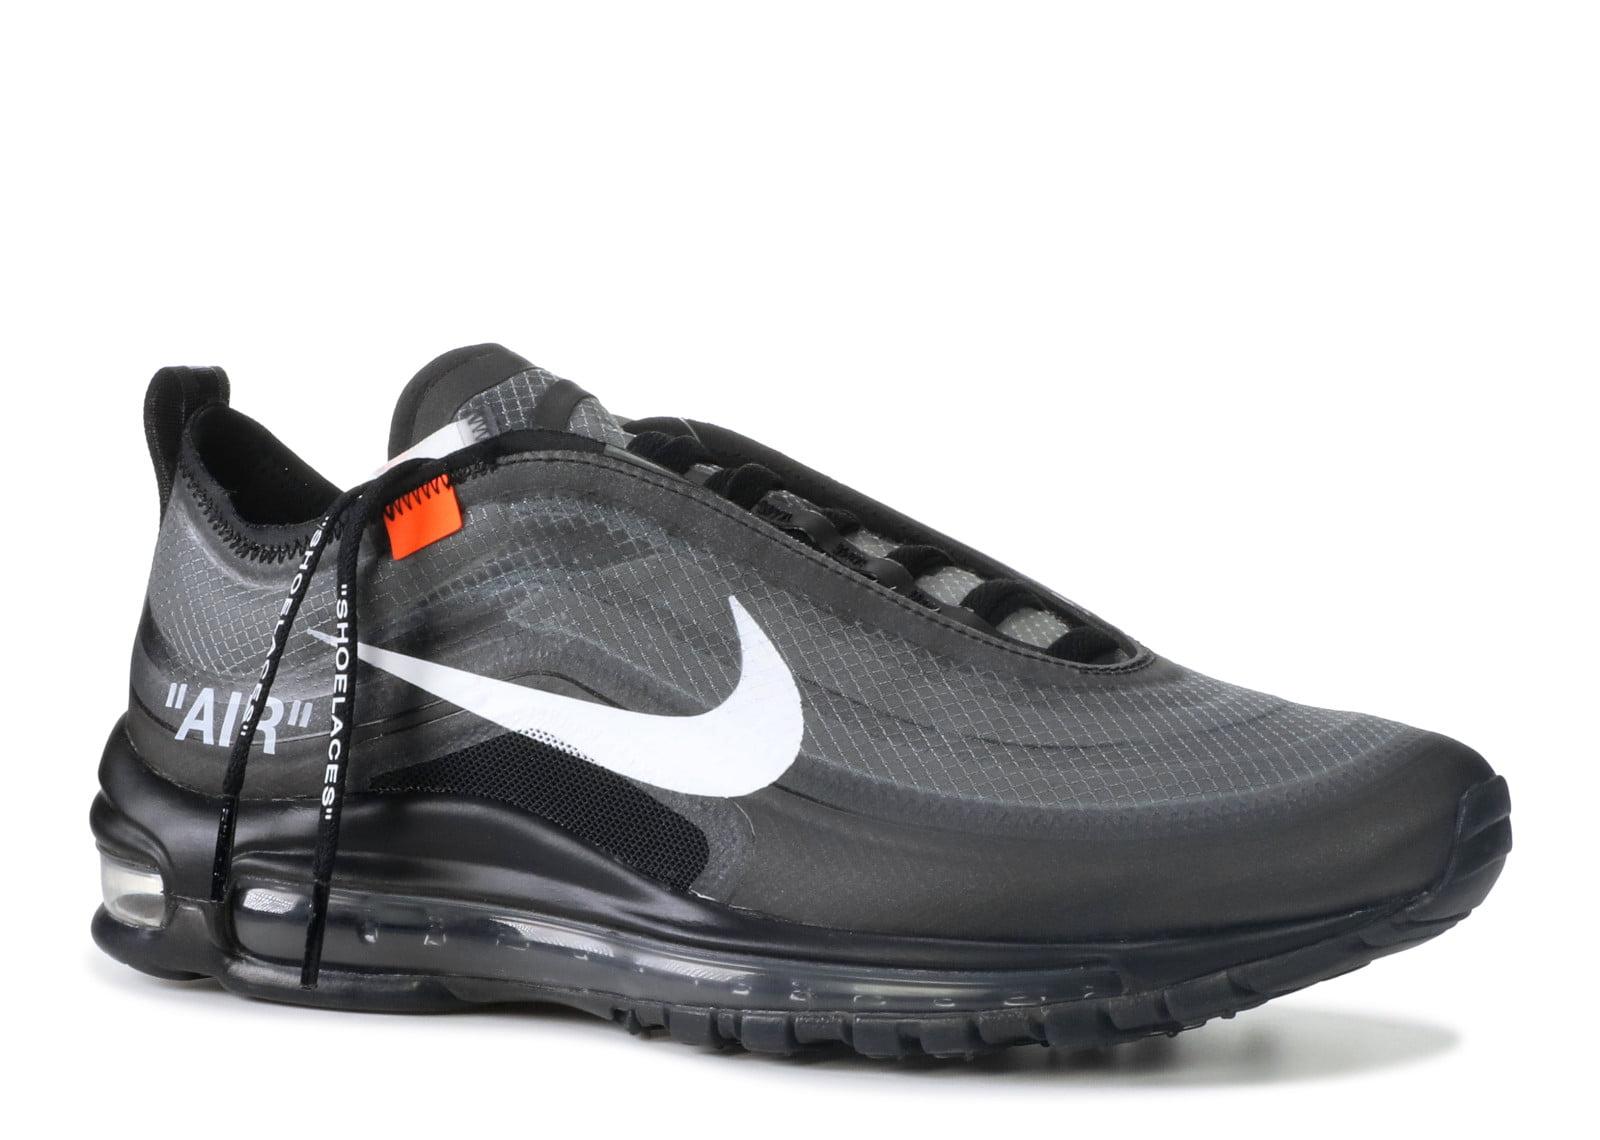 Nike - Men - Air Max 97 'Off White